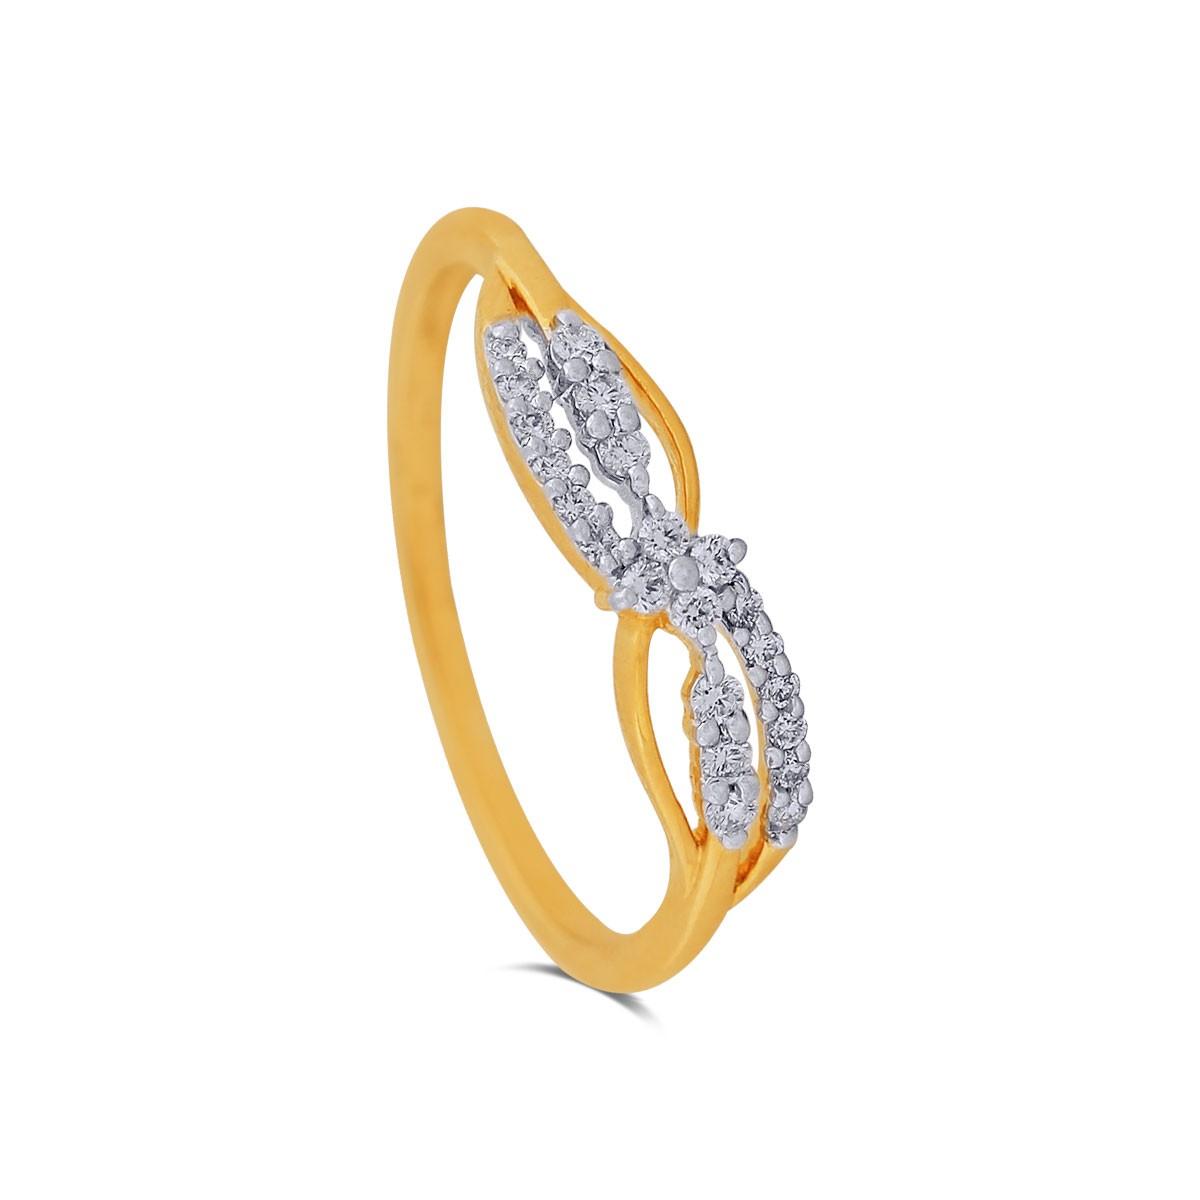 Erica Yellow Gold Diamond Ring